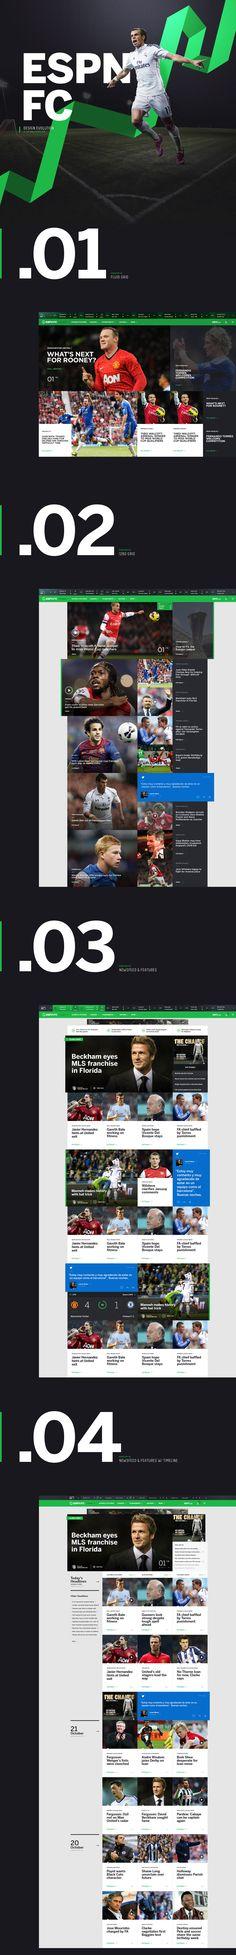 ESPN FC dot com on Behance